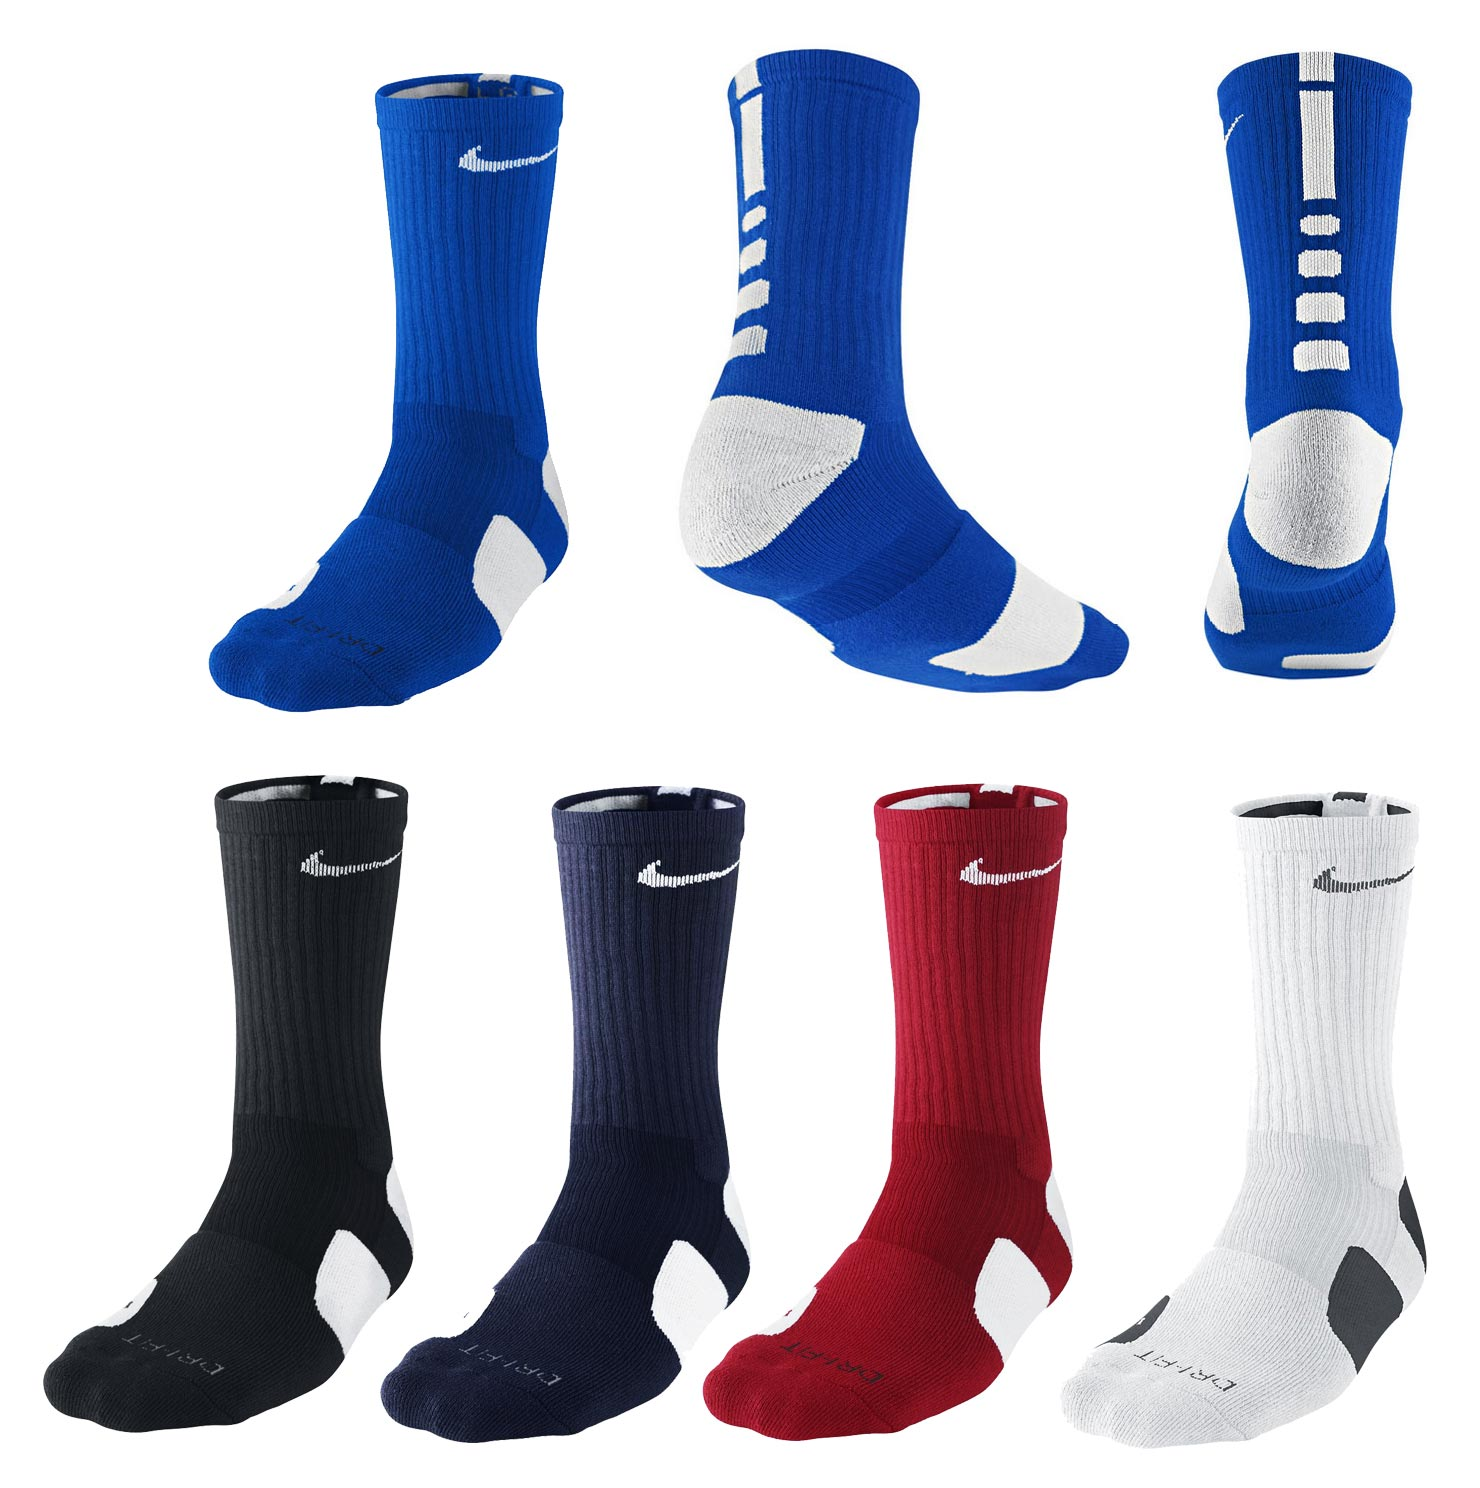 Best Sellers in Boys' Basketball Socks - amazon.com